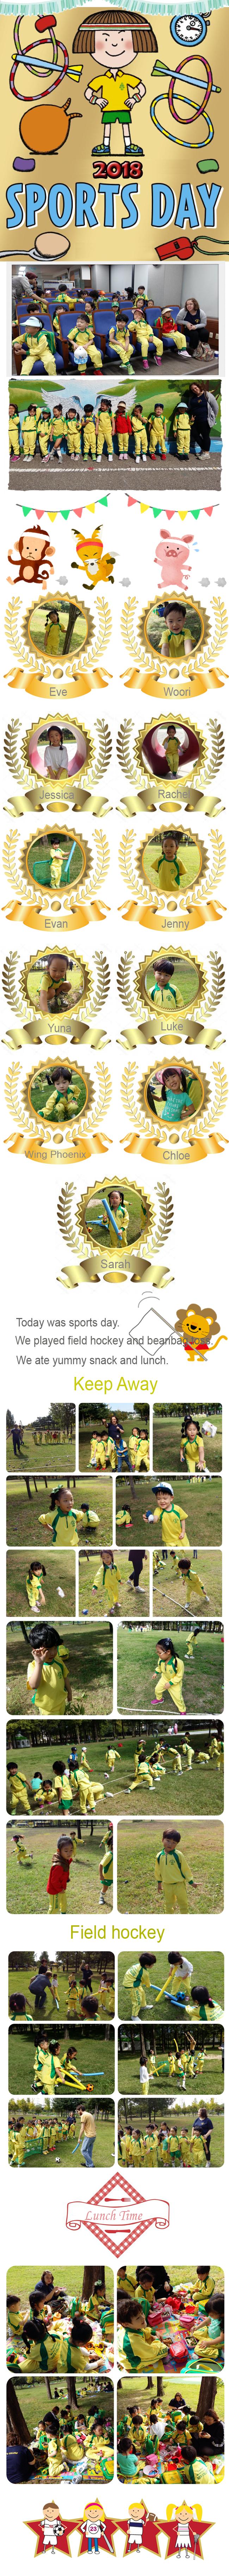 2018_Sports day copy.jpg